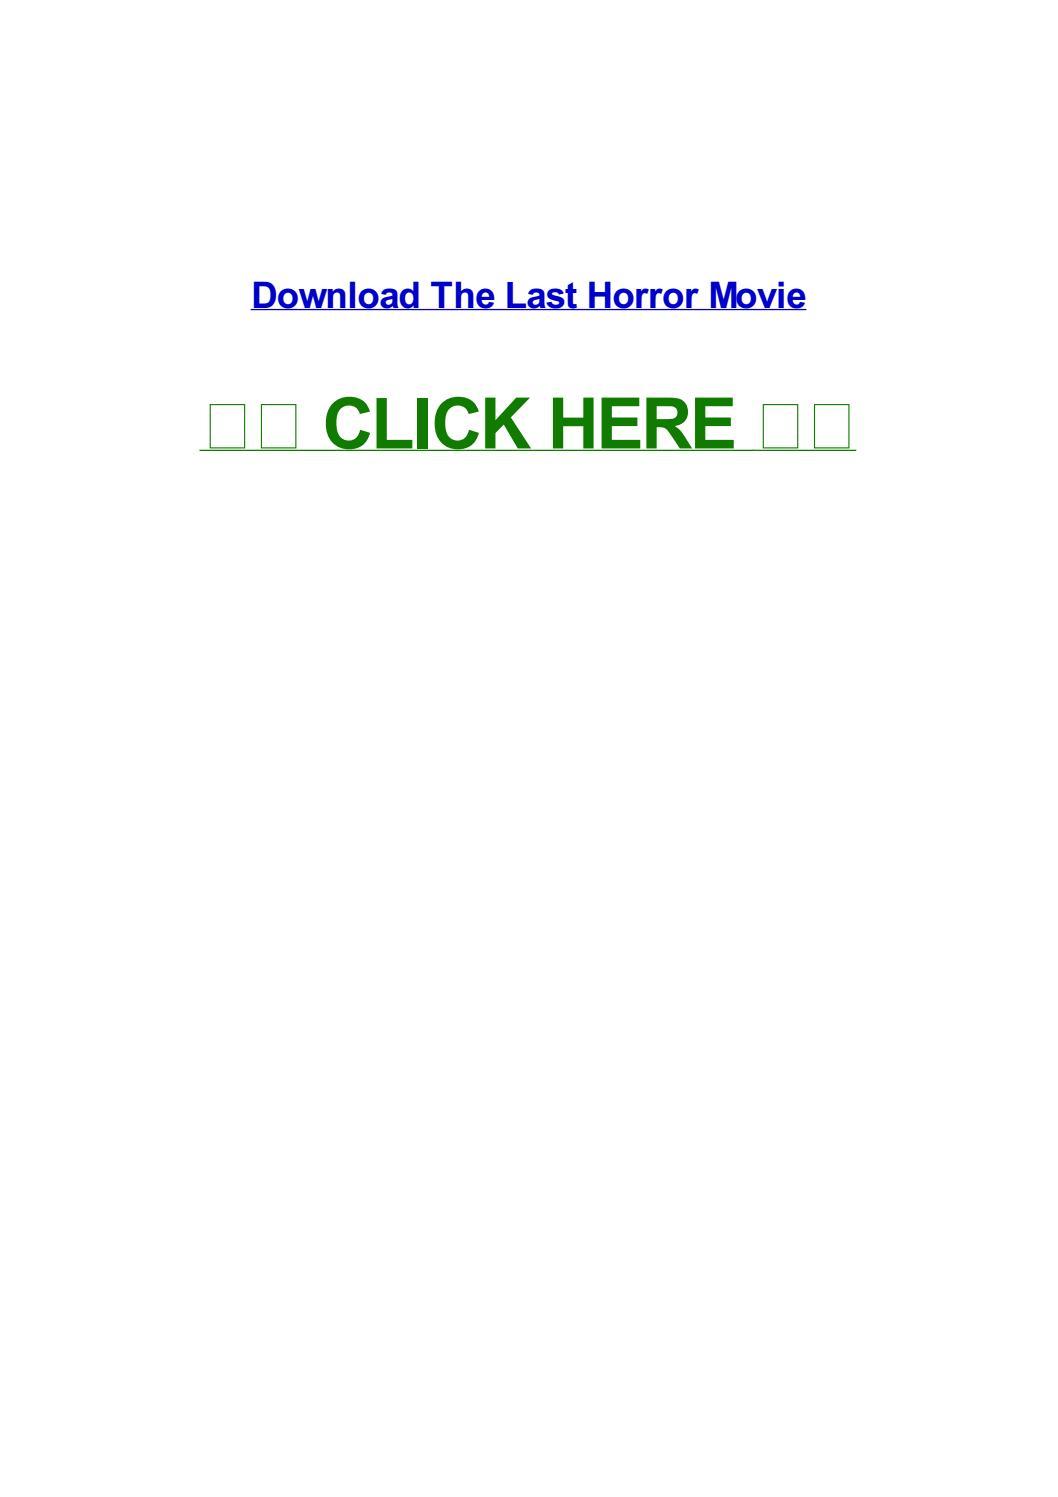 The Last Horror Movie By Susanacxw Issuu